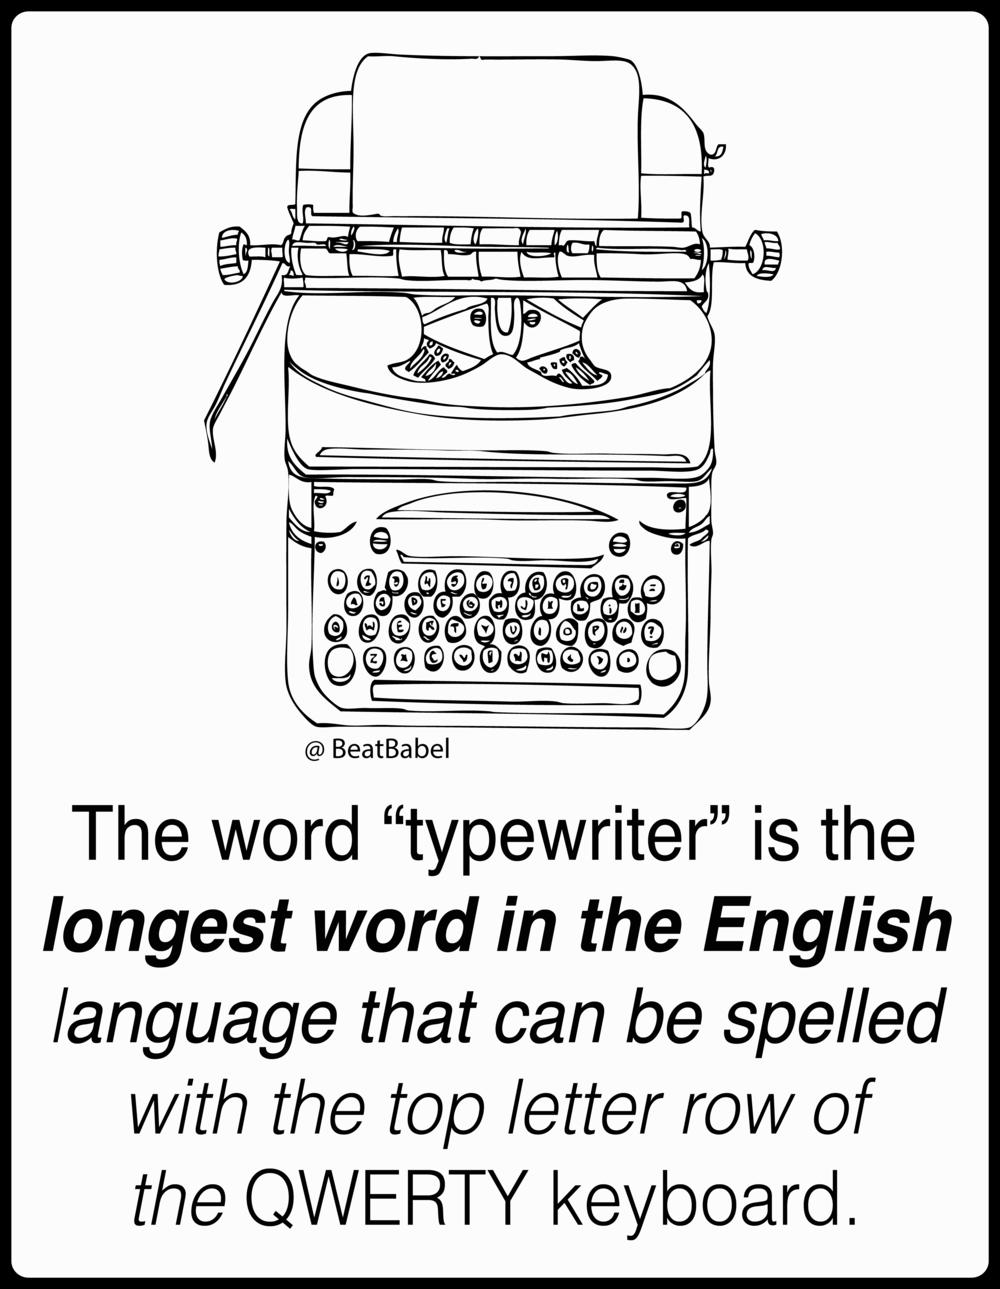 copywriting and transcreation